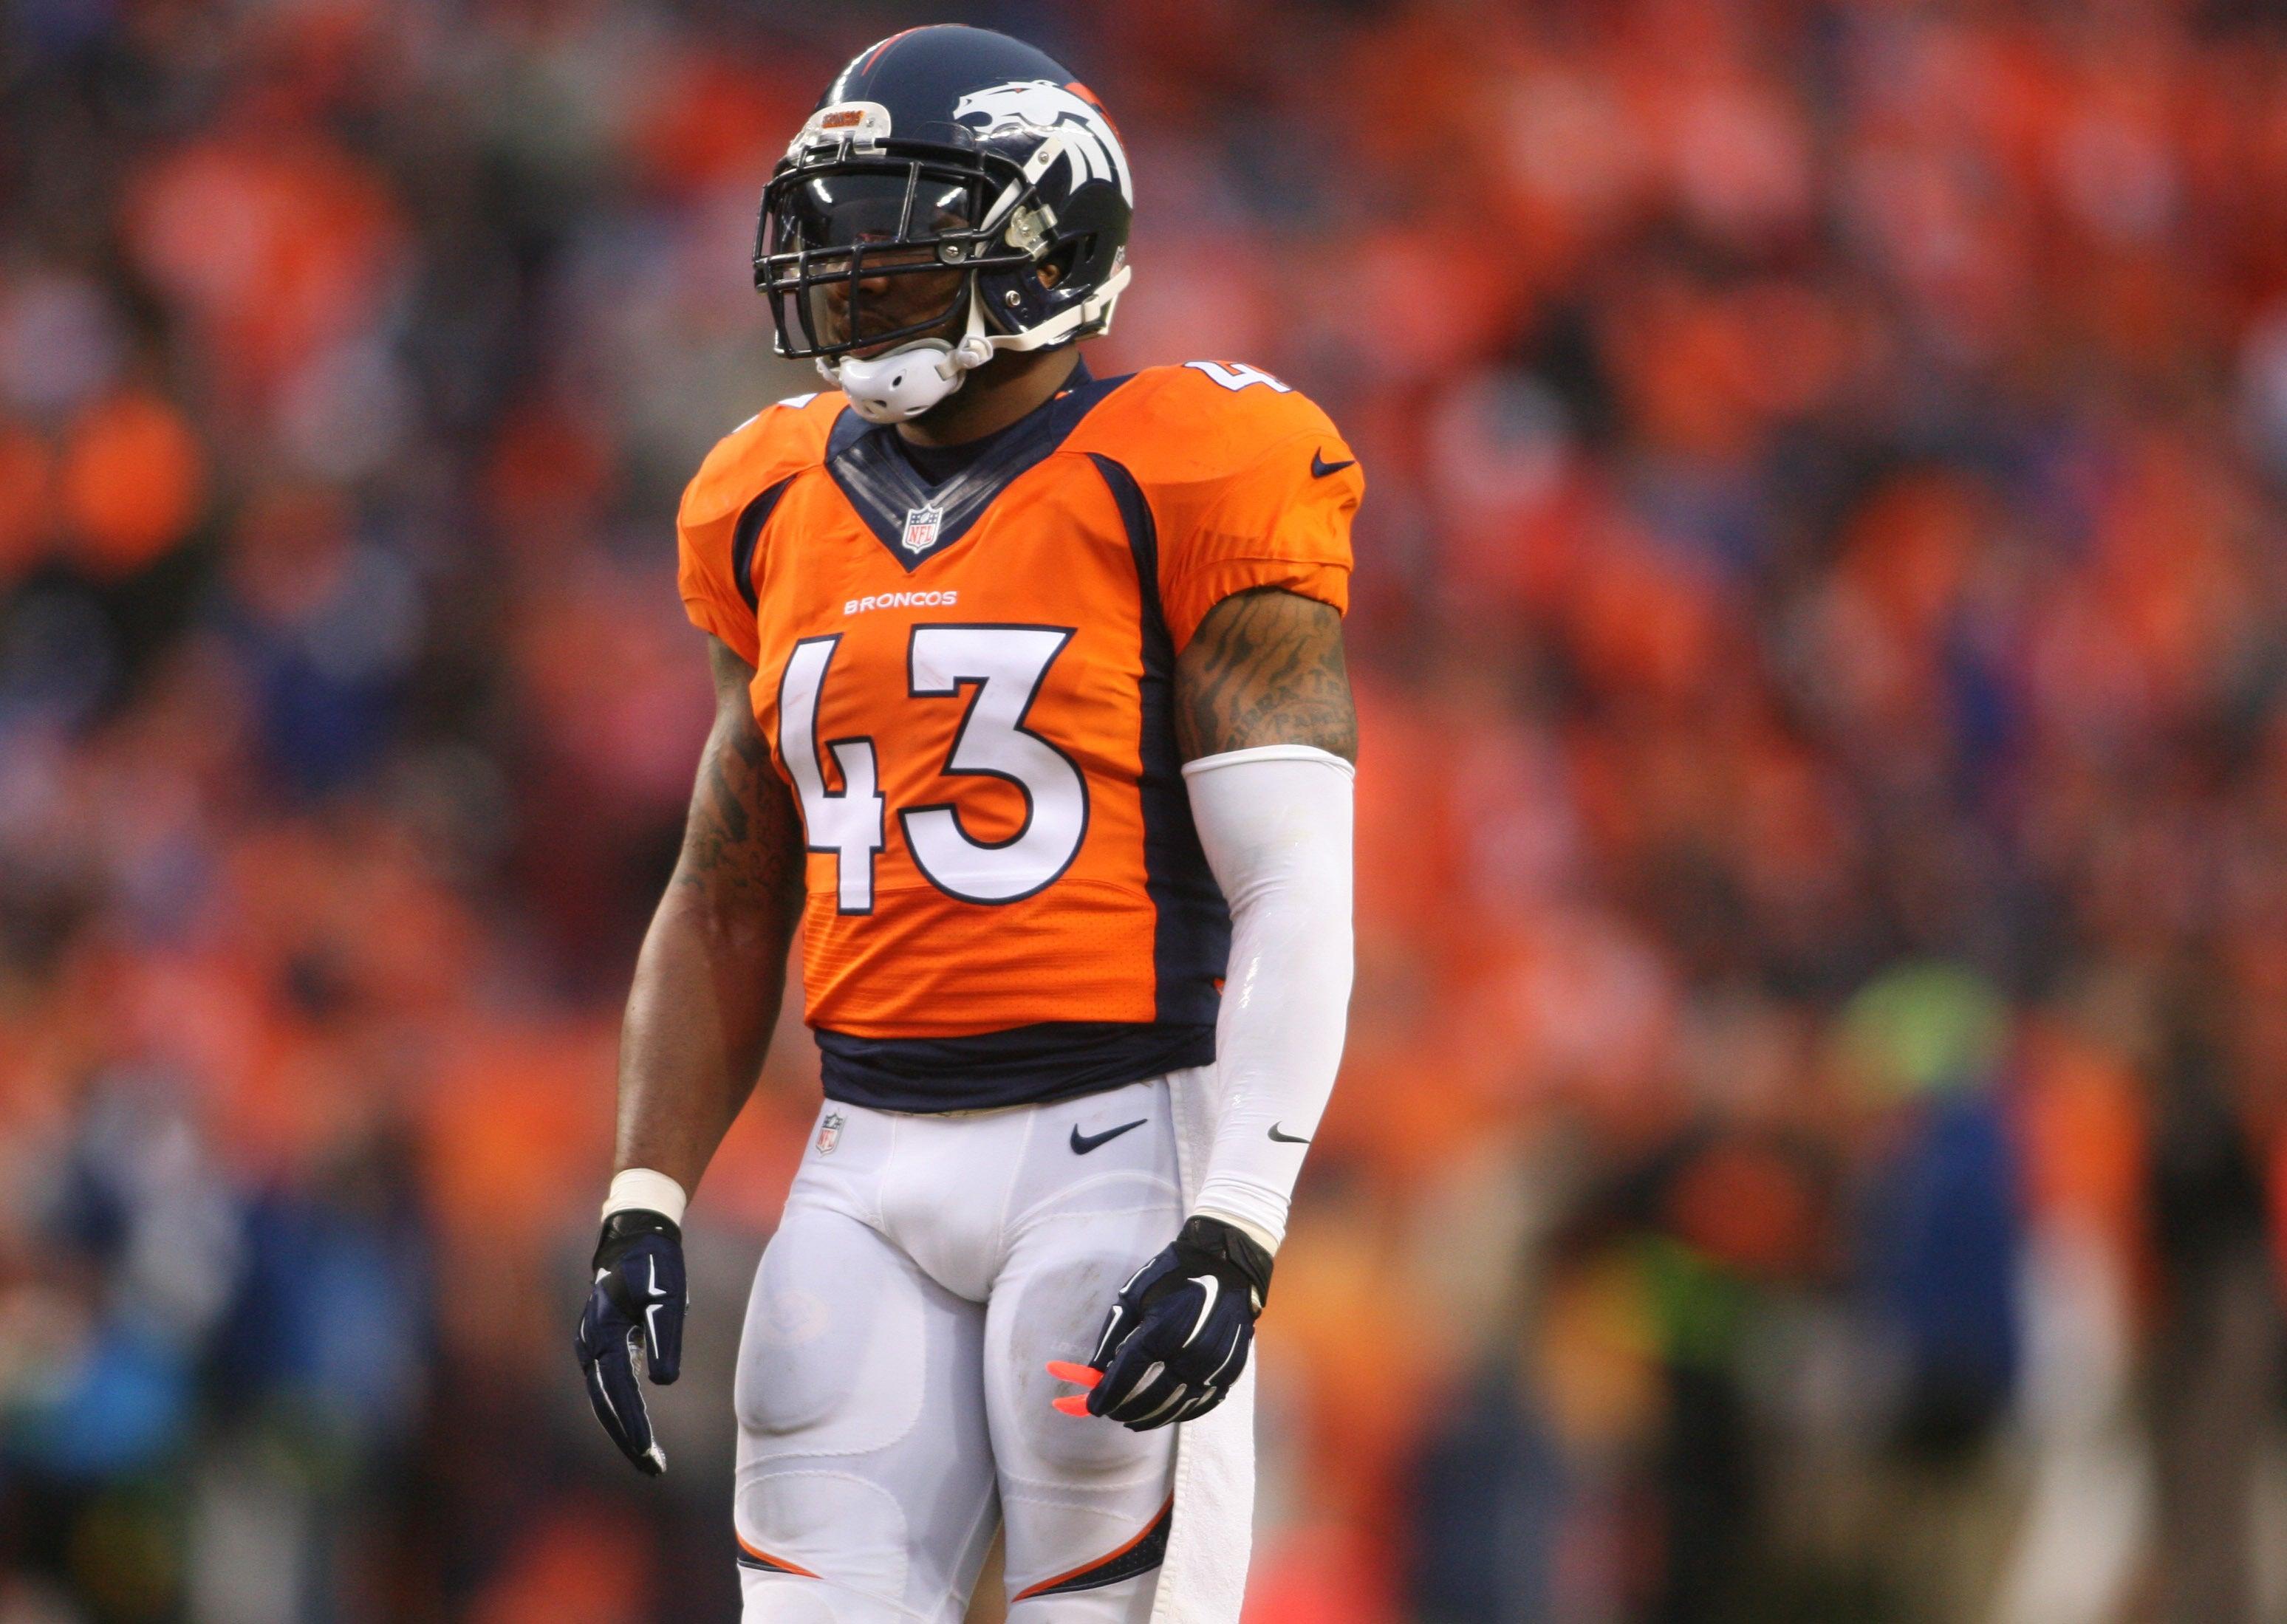 Report The Denver Broncos & Safety T J Ward Have Been In Talks